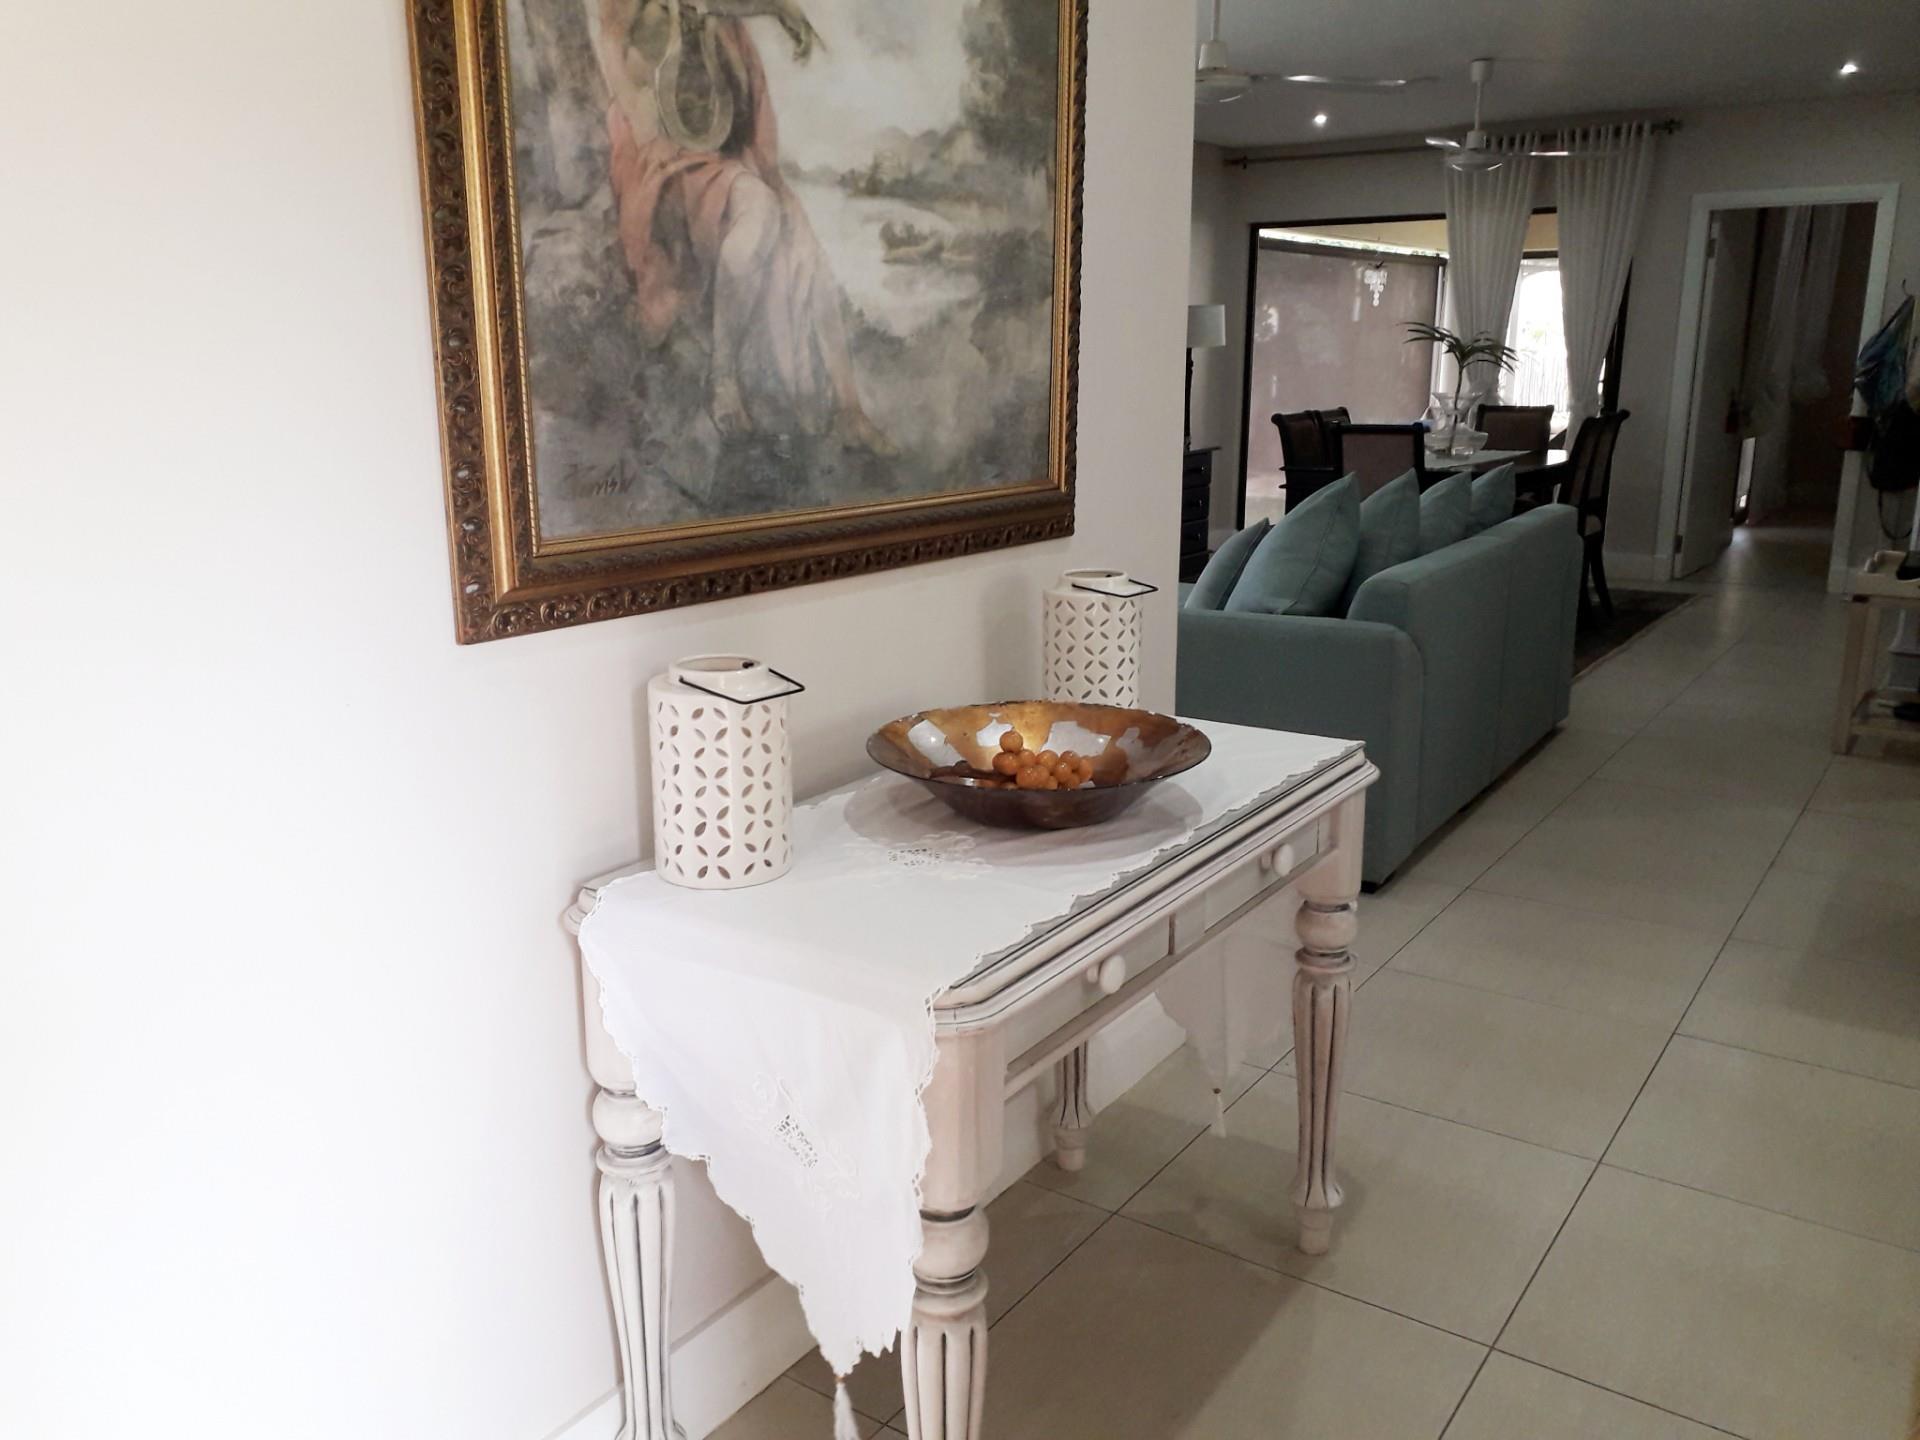 3 Bedroom Simplex For Sale in Ballito Central